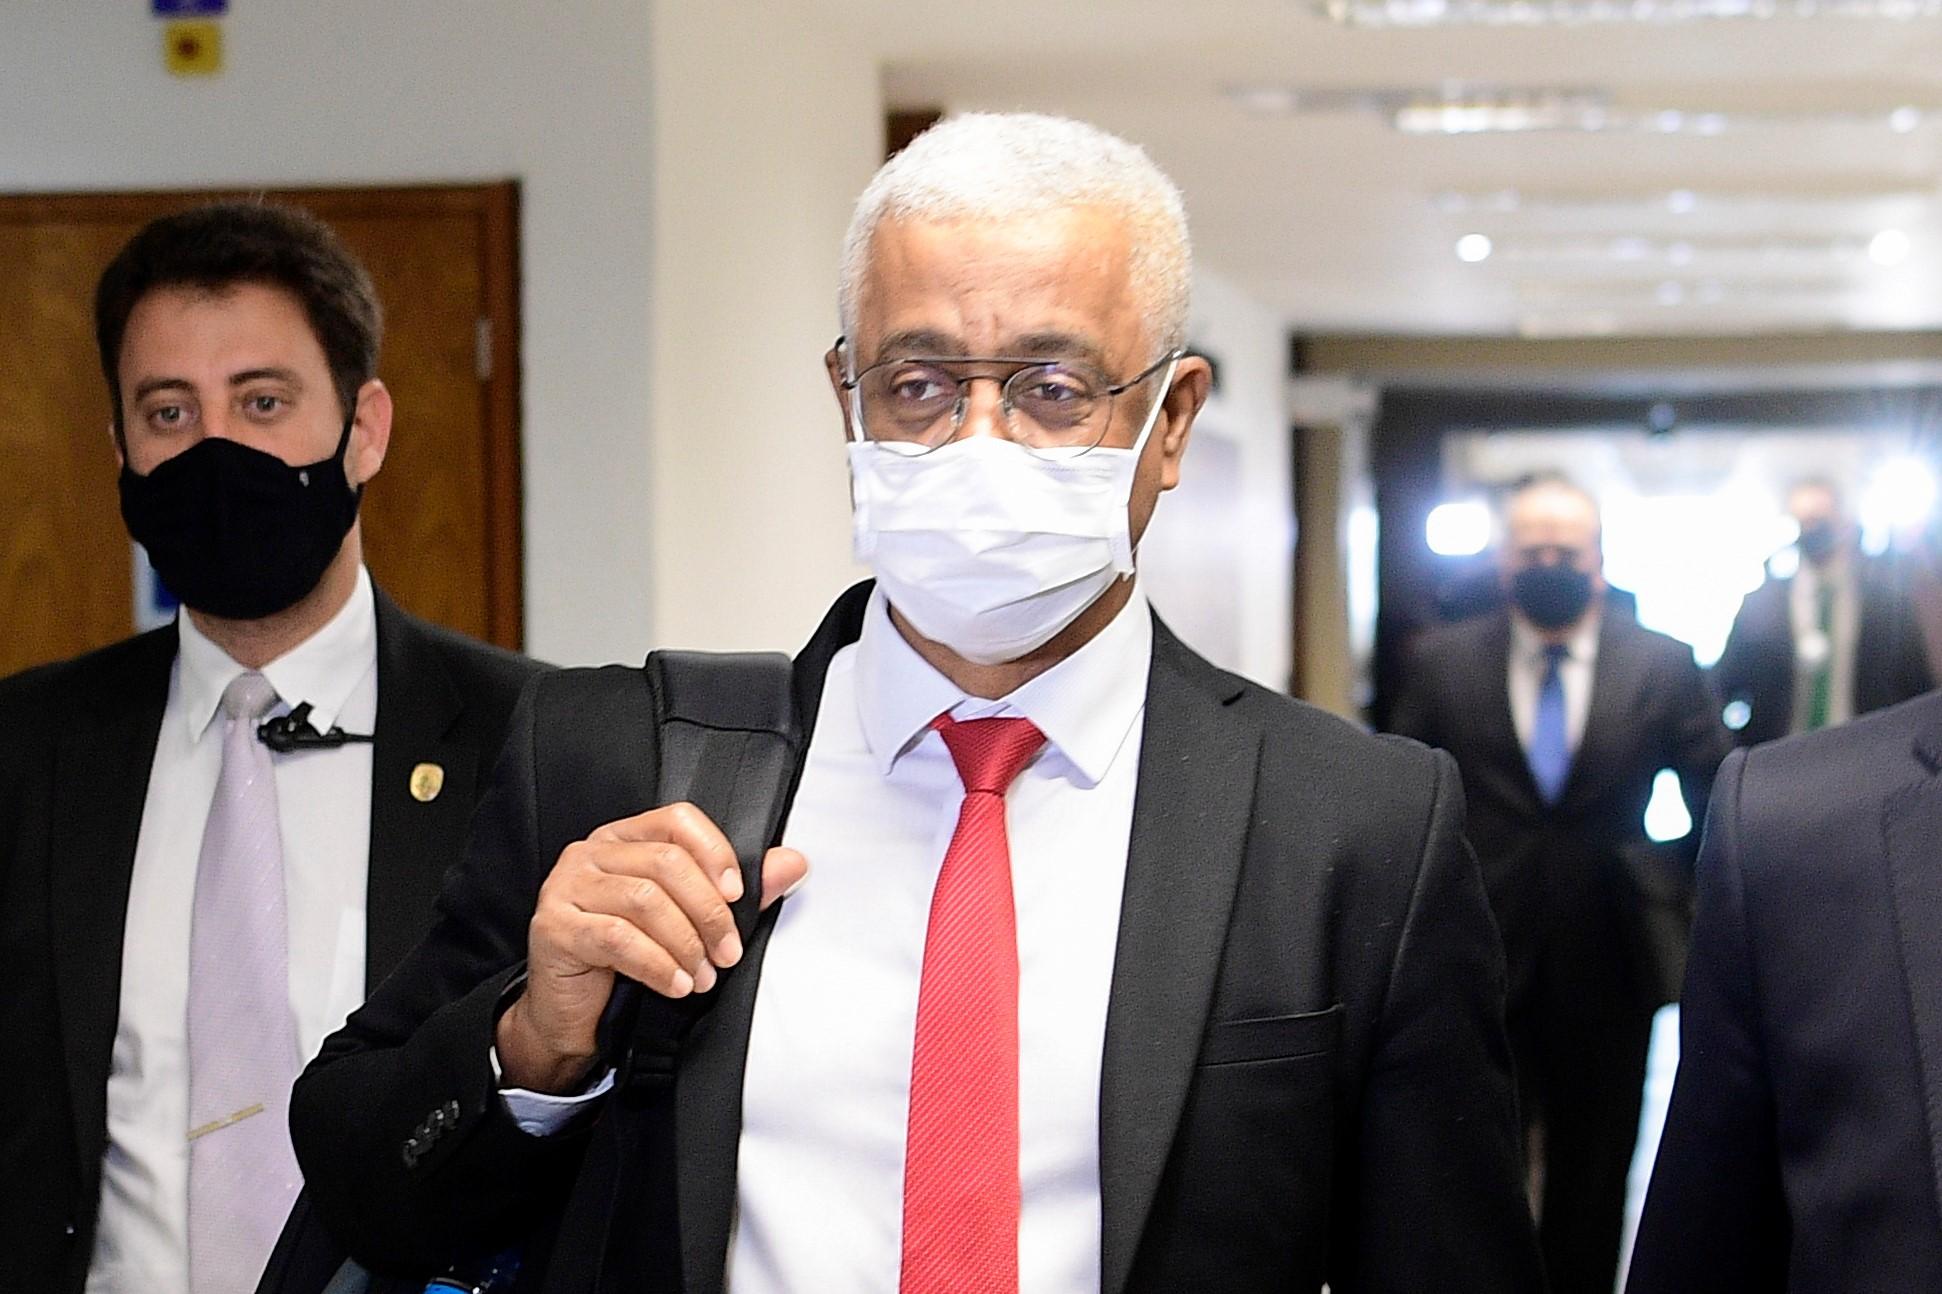 IMAGEM: Representante da Vitamedic admite que empresa patrocinou médicos bolsonaristas